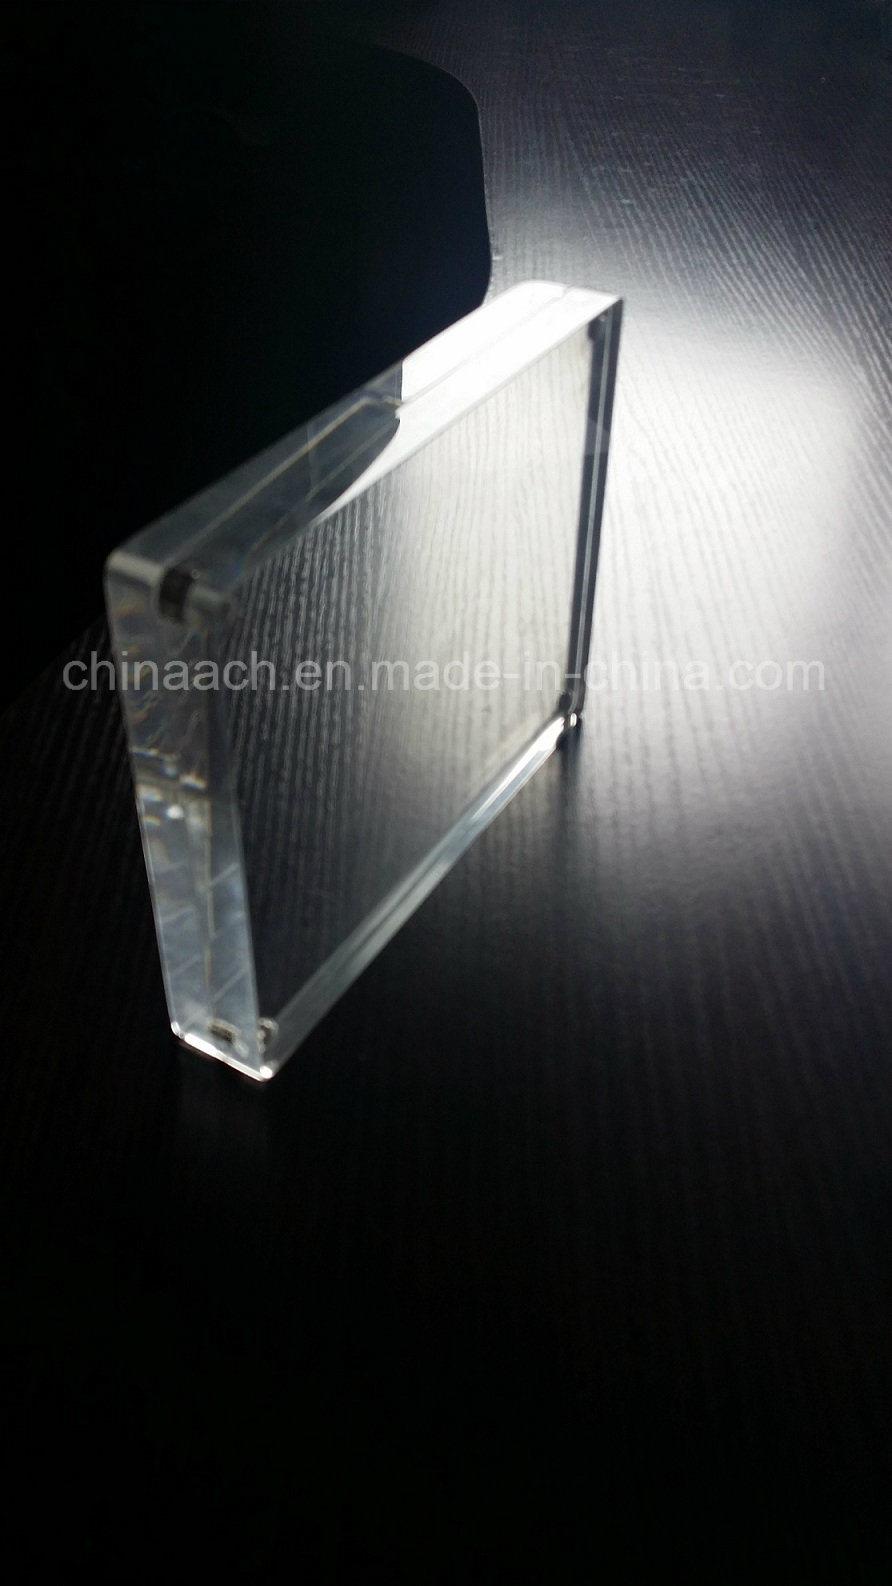 Cast Acrylic PMMA Sheet Professional Supplier